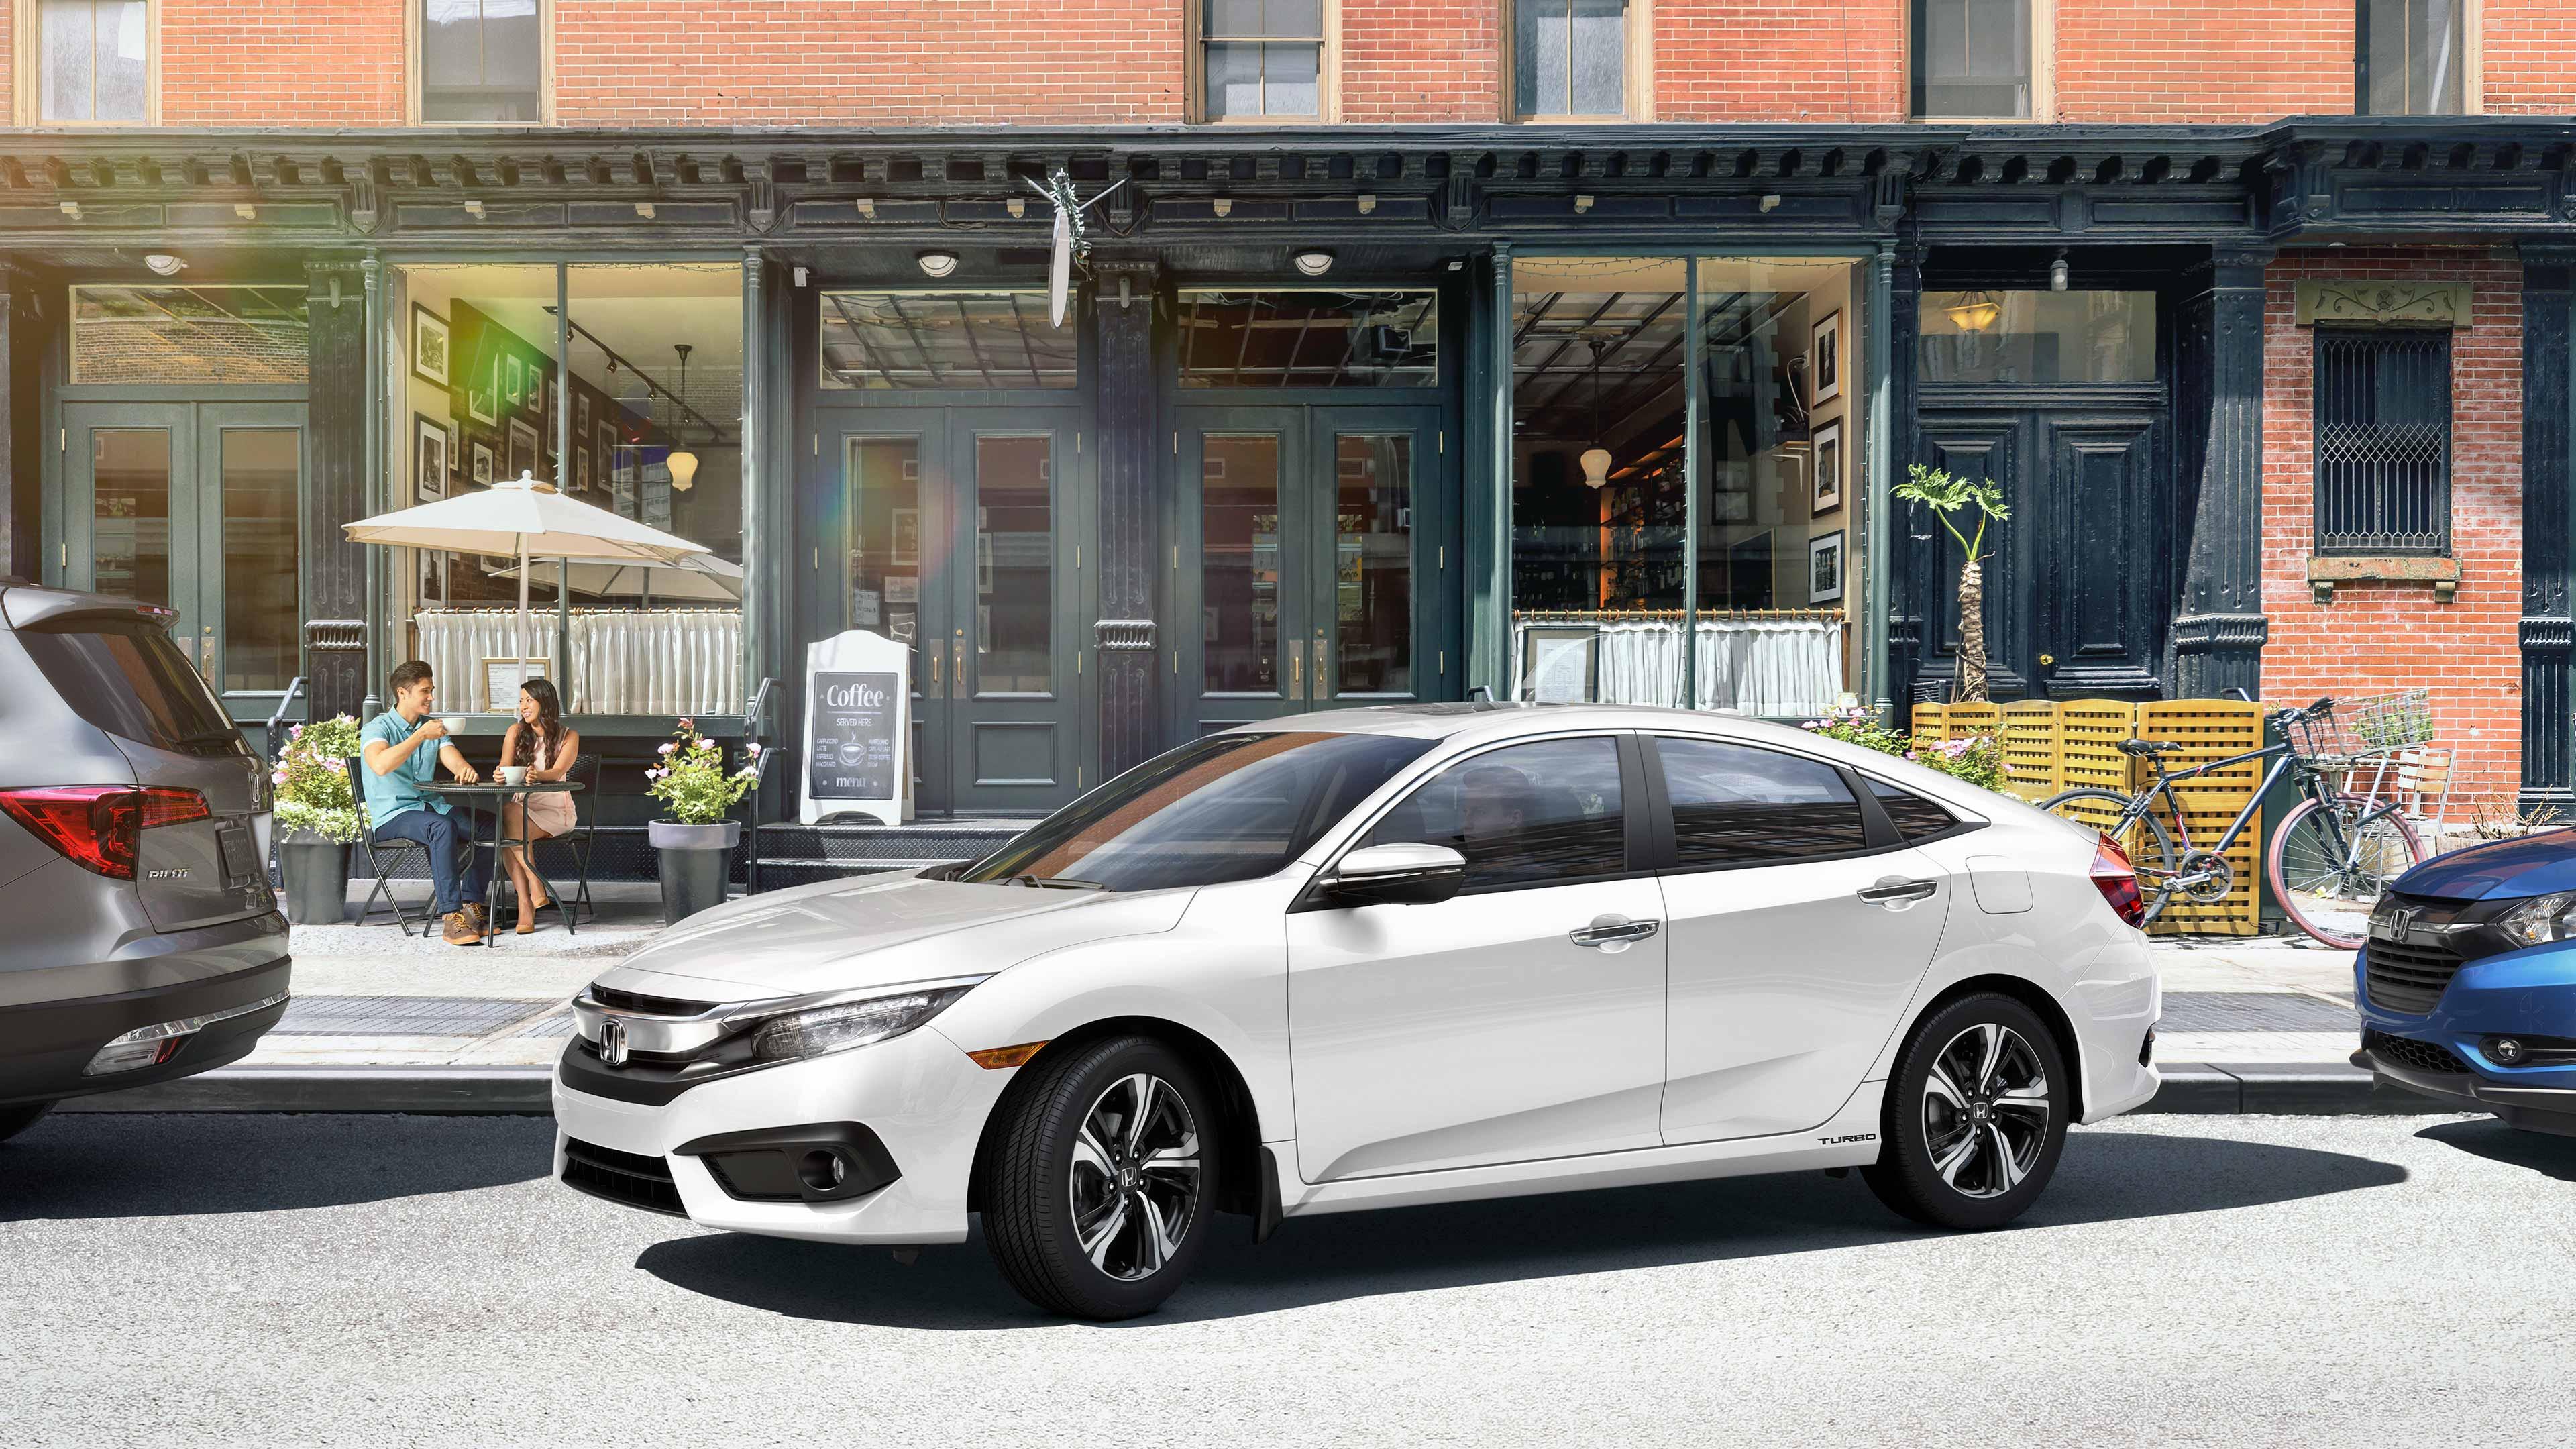 Honda Civic 2017 Exterior